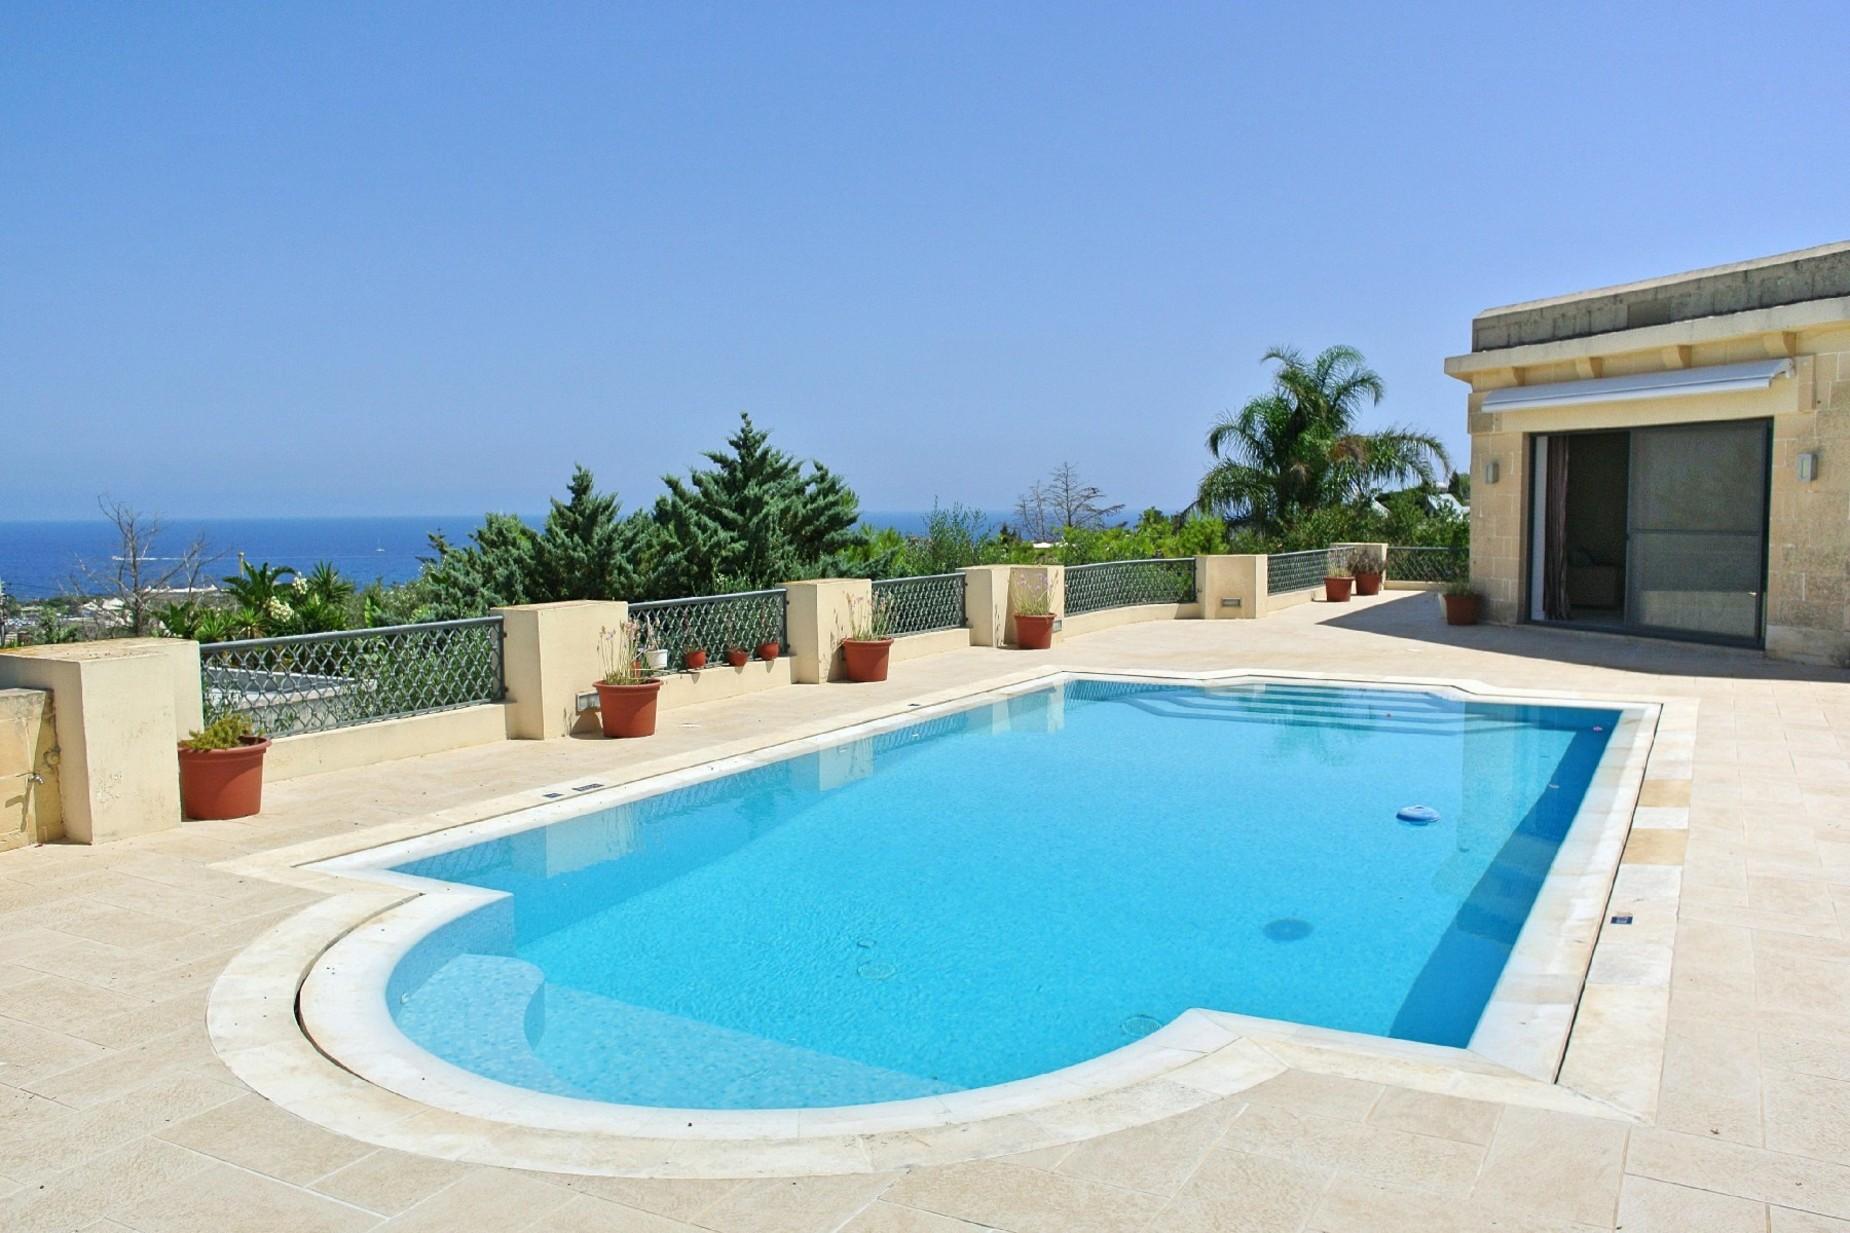 4 bed Villa For Rent in Bahar ic-Caghaq, Bahar ic-Caghaq - thumb 2